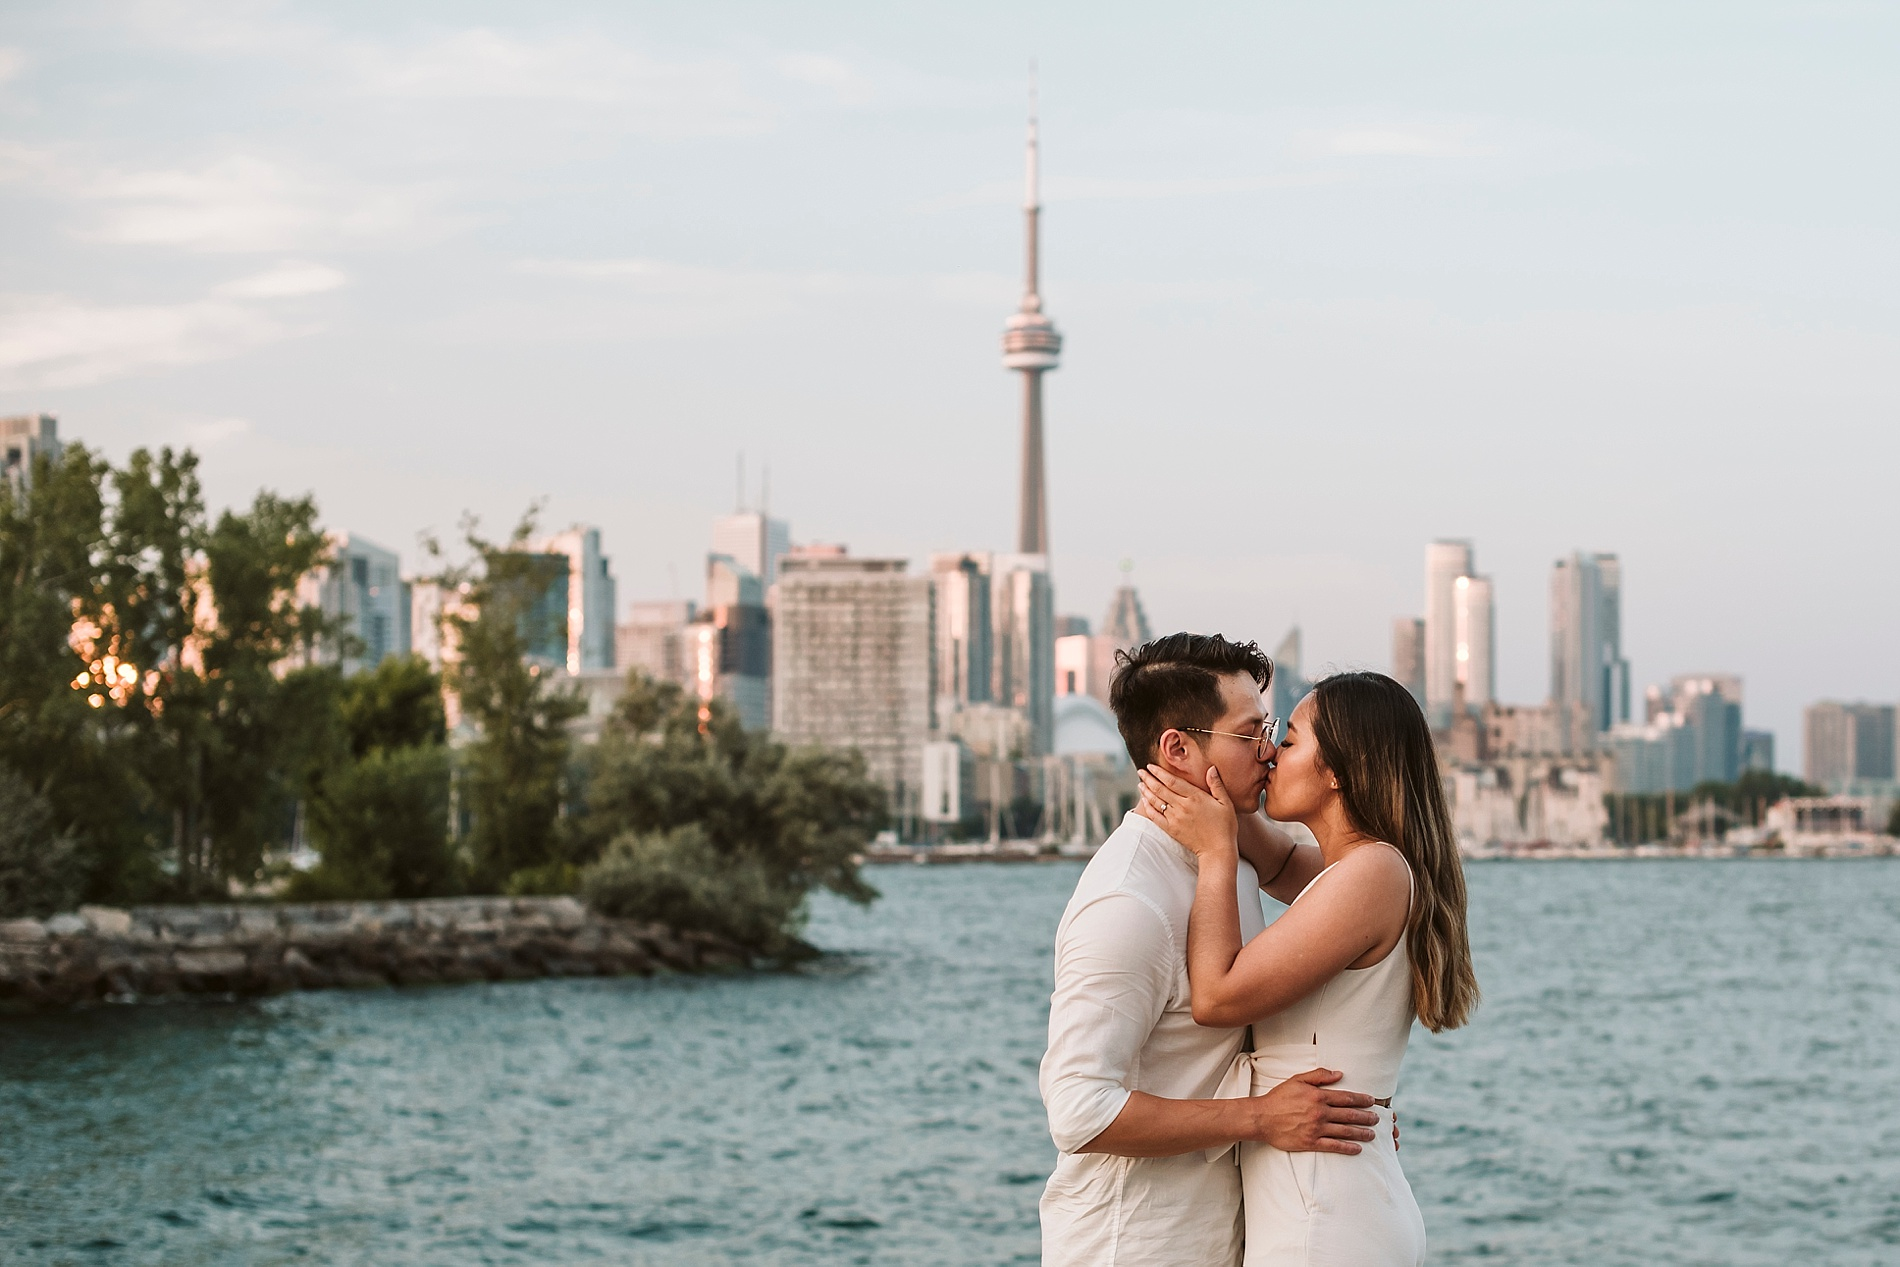 Toronto_Engagement_shoot_Ontario_Place_Lakeshore_0013.jpg